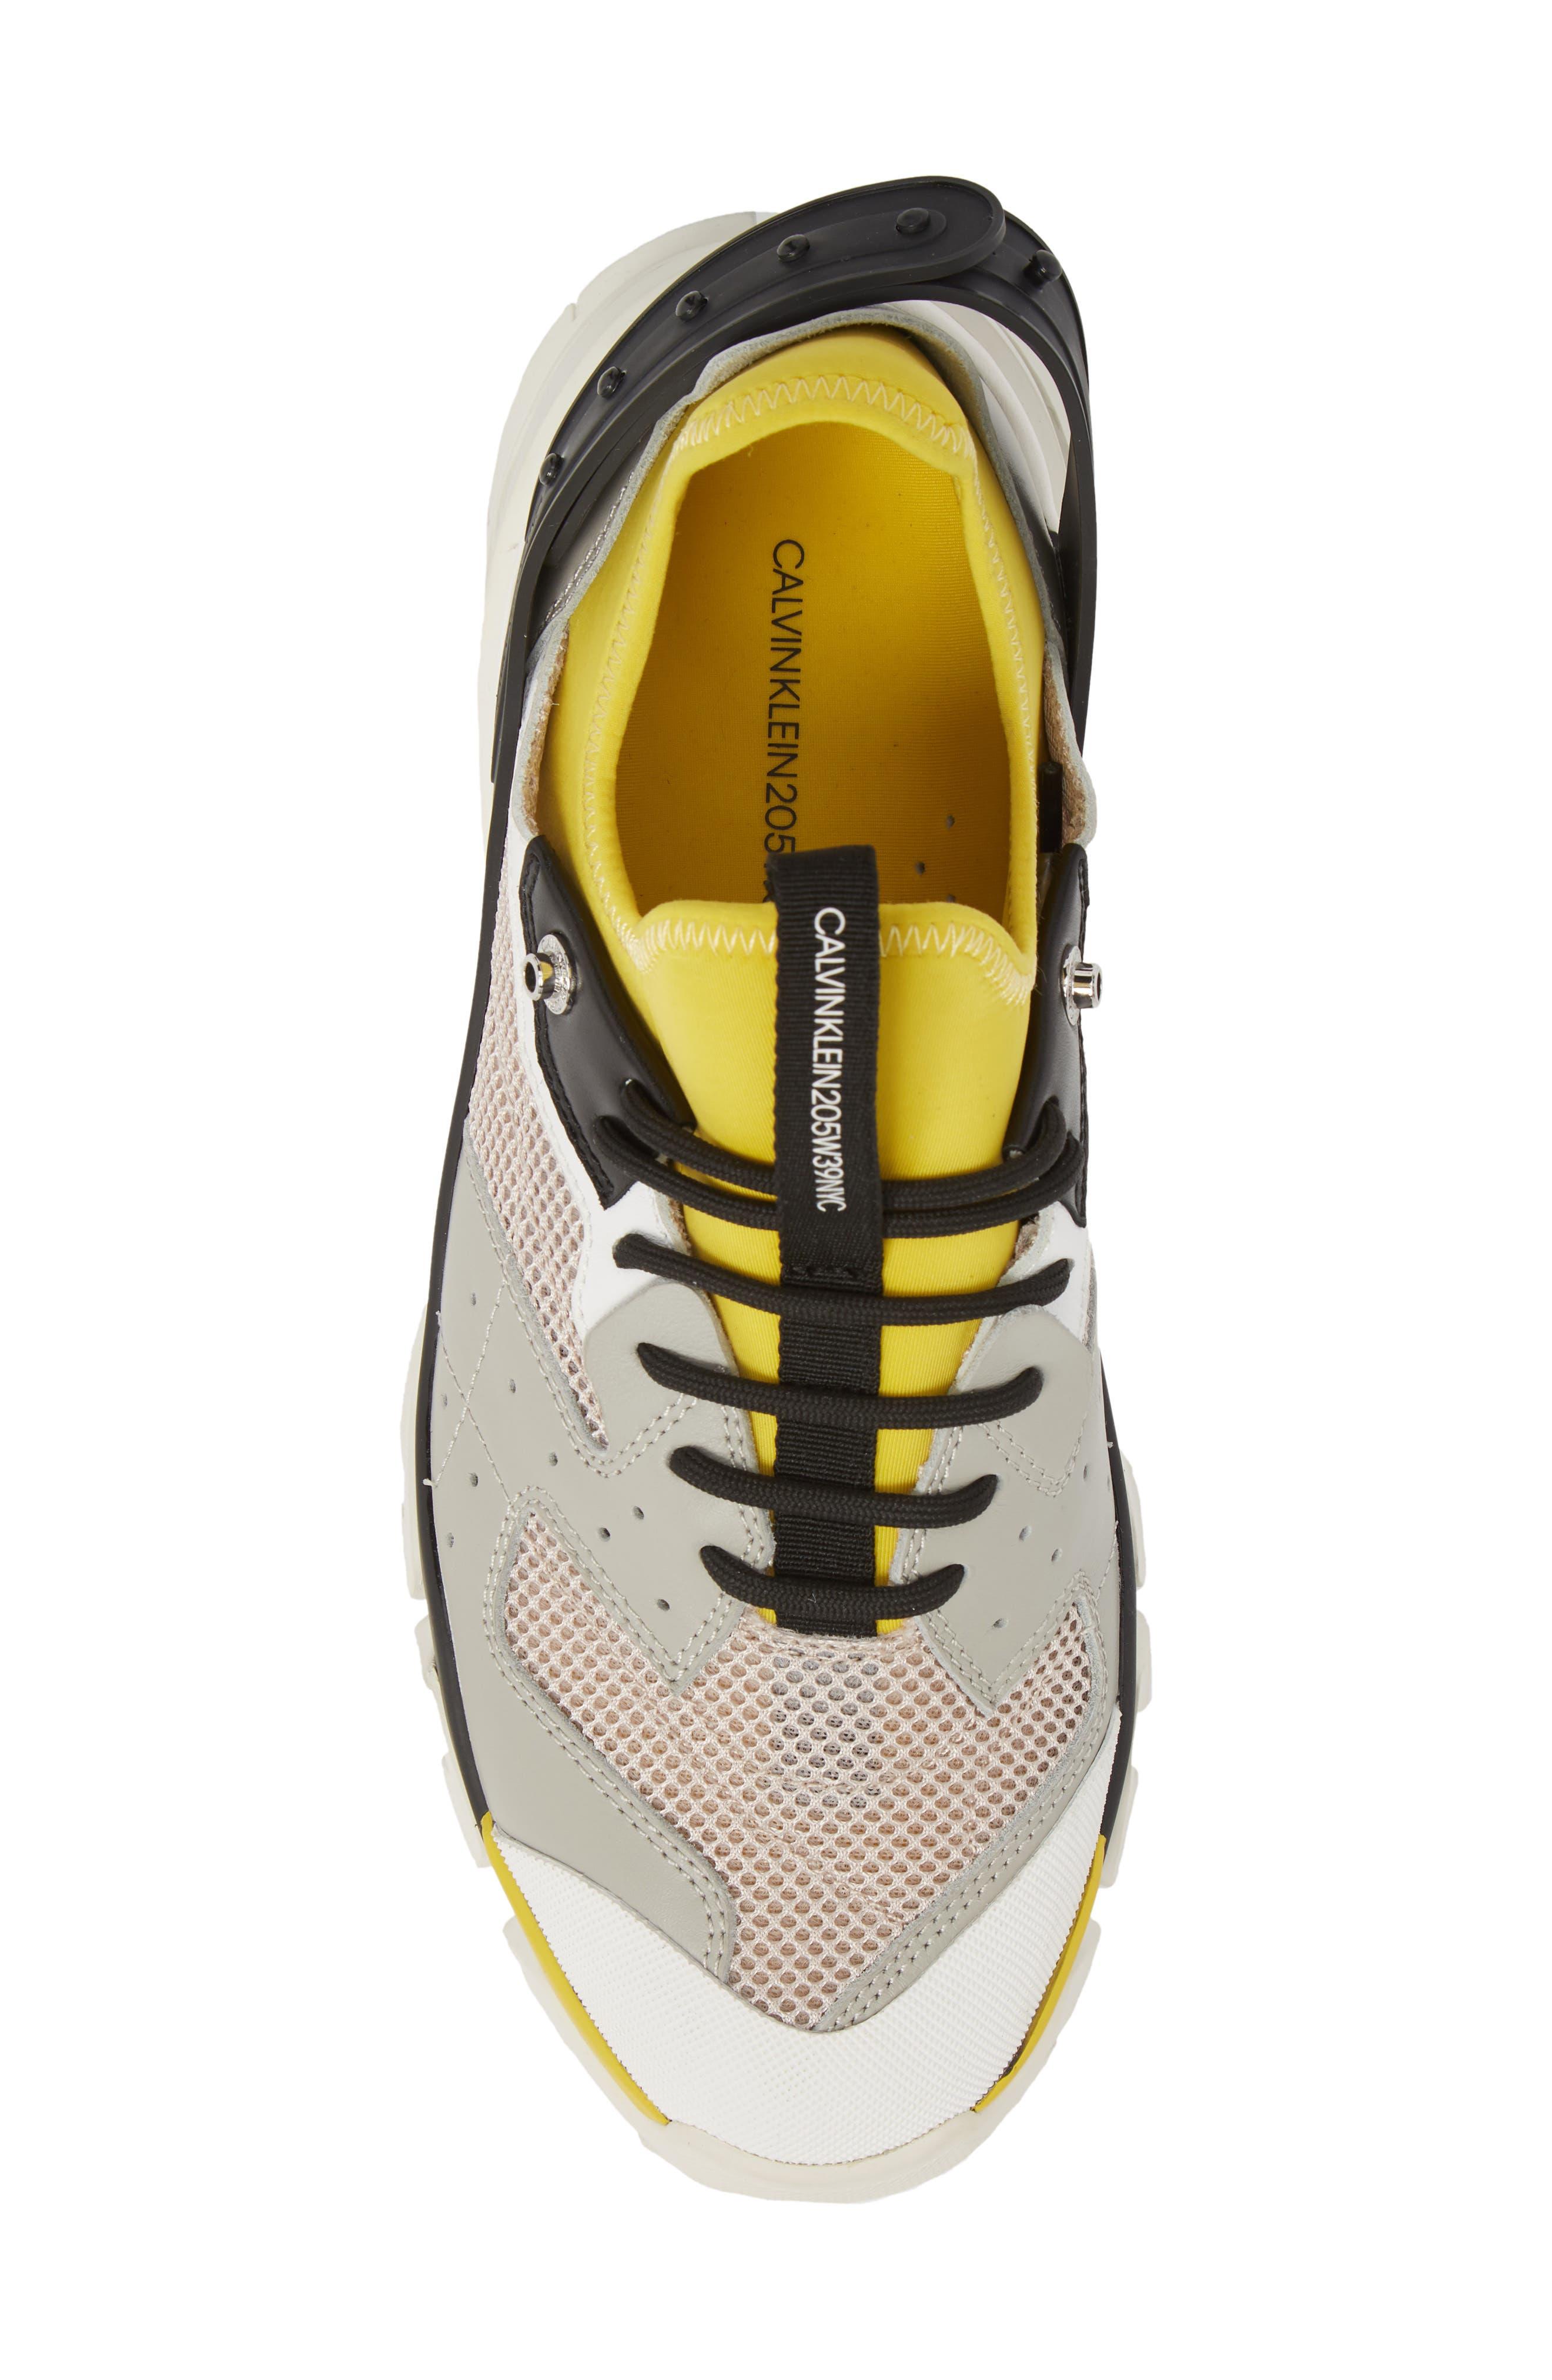 Carlos 10 Snapback Runner Sneaker,                             Alternate thumbnail 5, color,                             GREY/ YELLOW/ BLACK/ WHITE